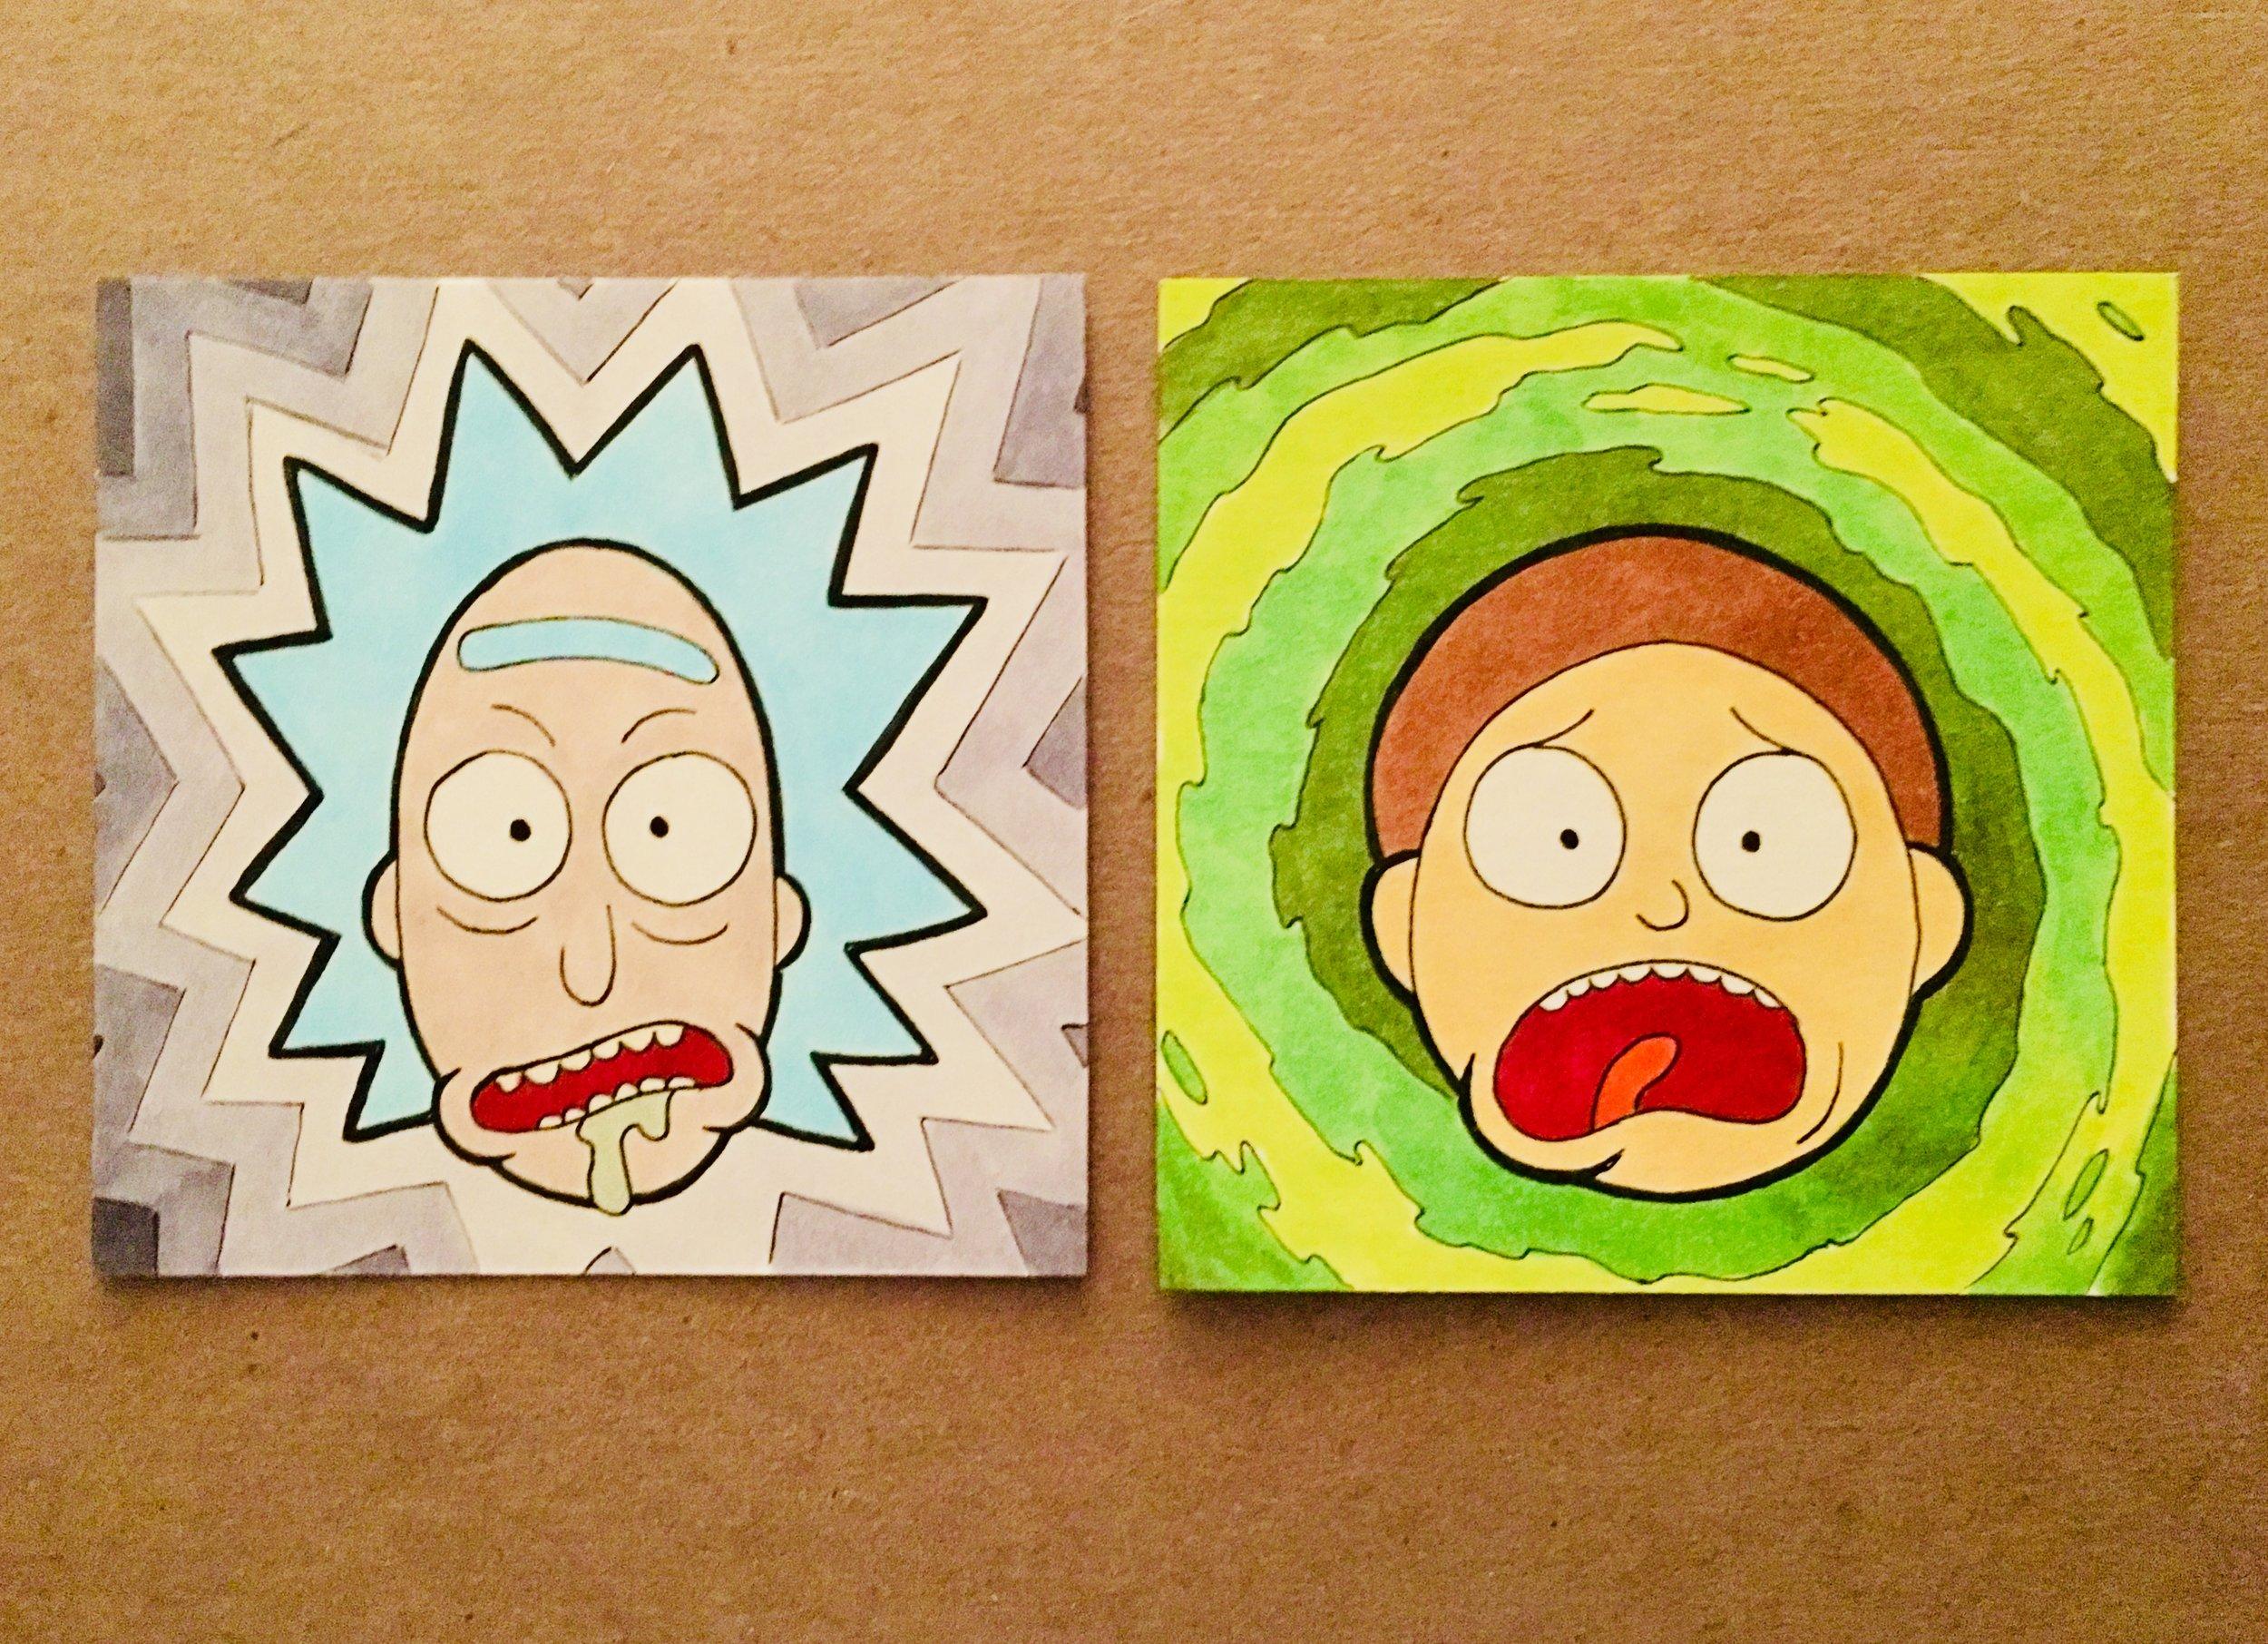 Rick & Morty (2018)